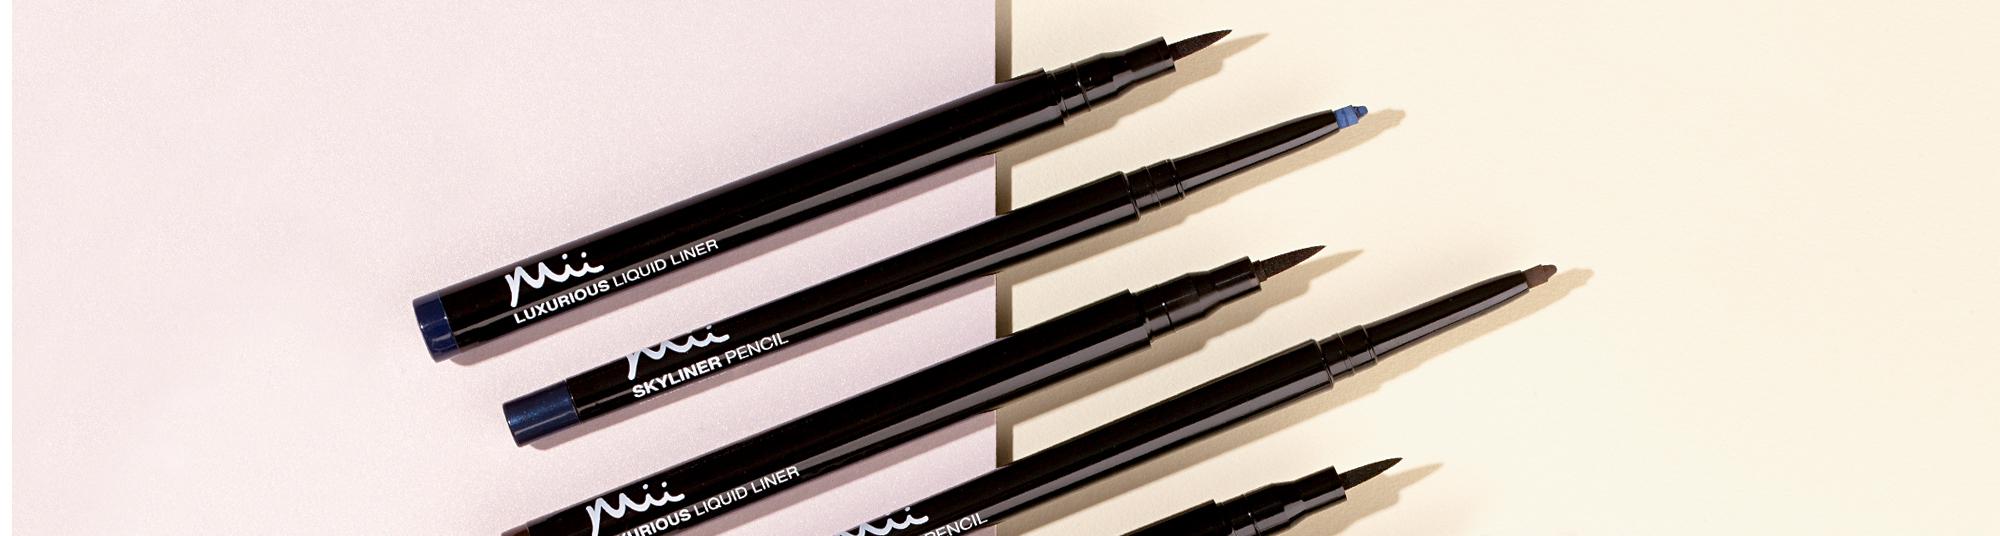 Mii Cosmetics Eyeliner category